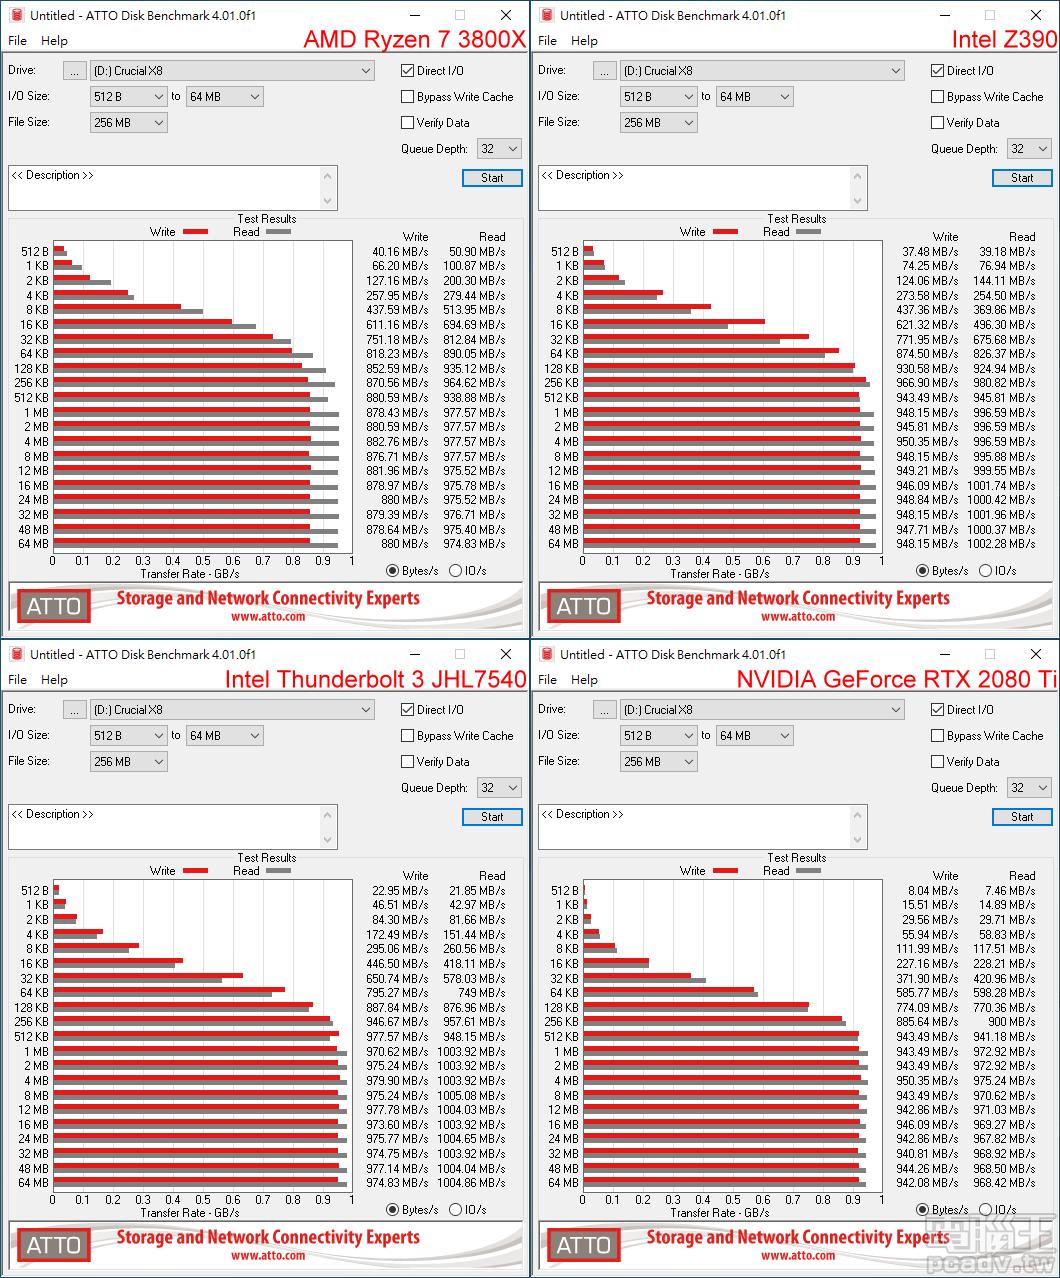 Crucial X8 於 ATTO Disk Benchmark 傳輸頻寬表現,Intel 平台表現較好,並以 Thunderbolt 3 最佳。(點圖放大)